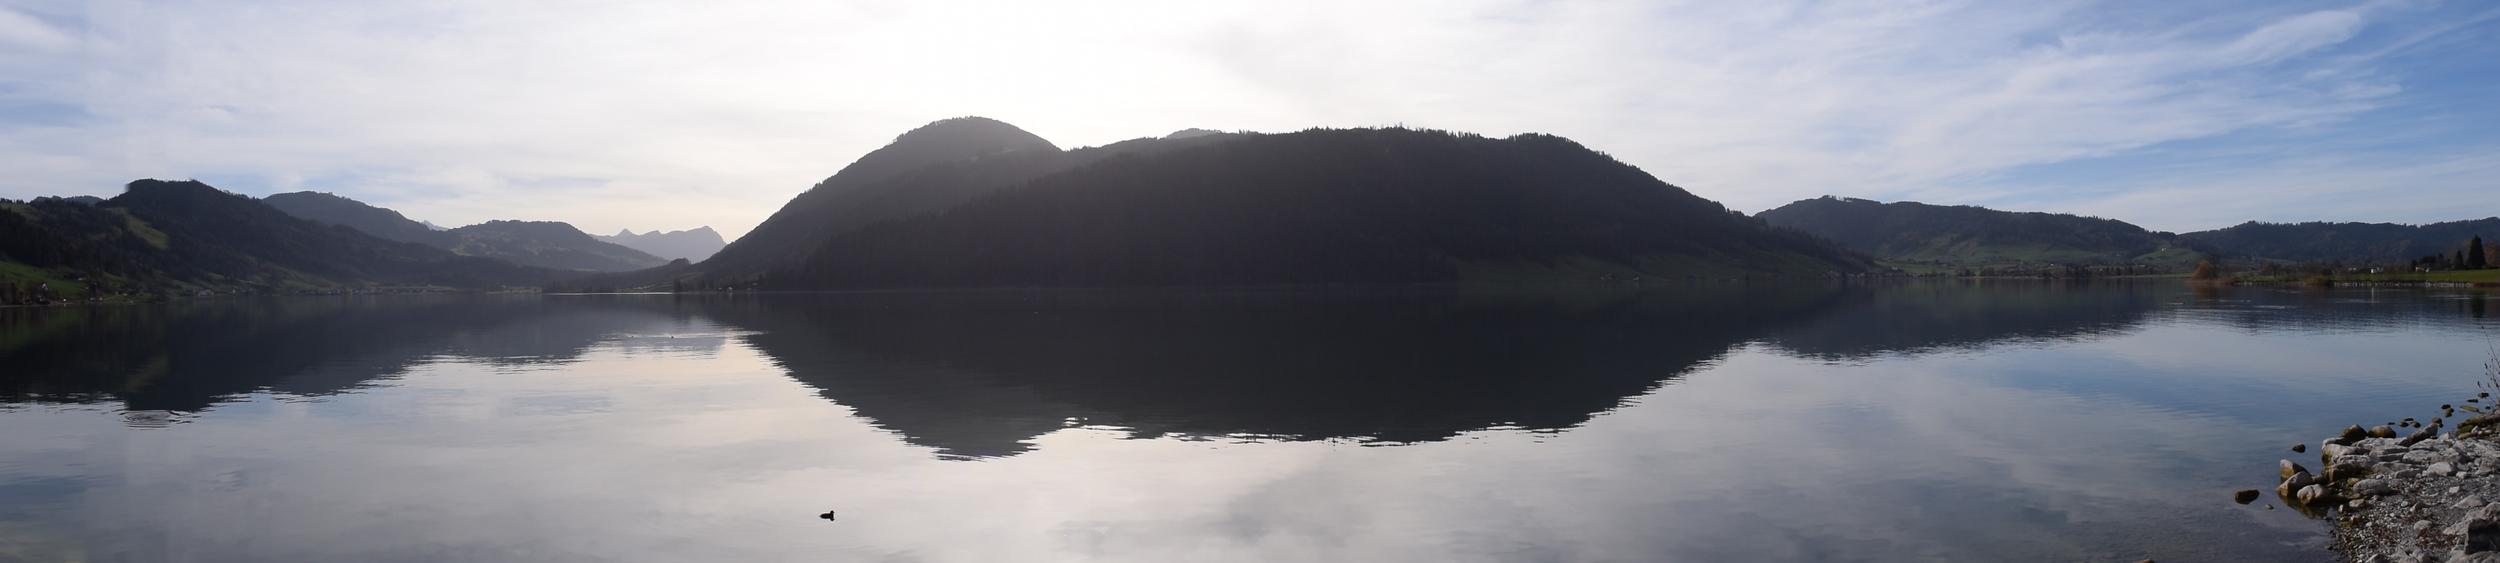 Lake Ägeri, Switzerland